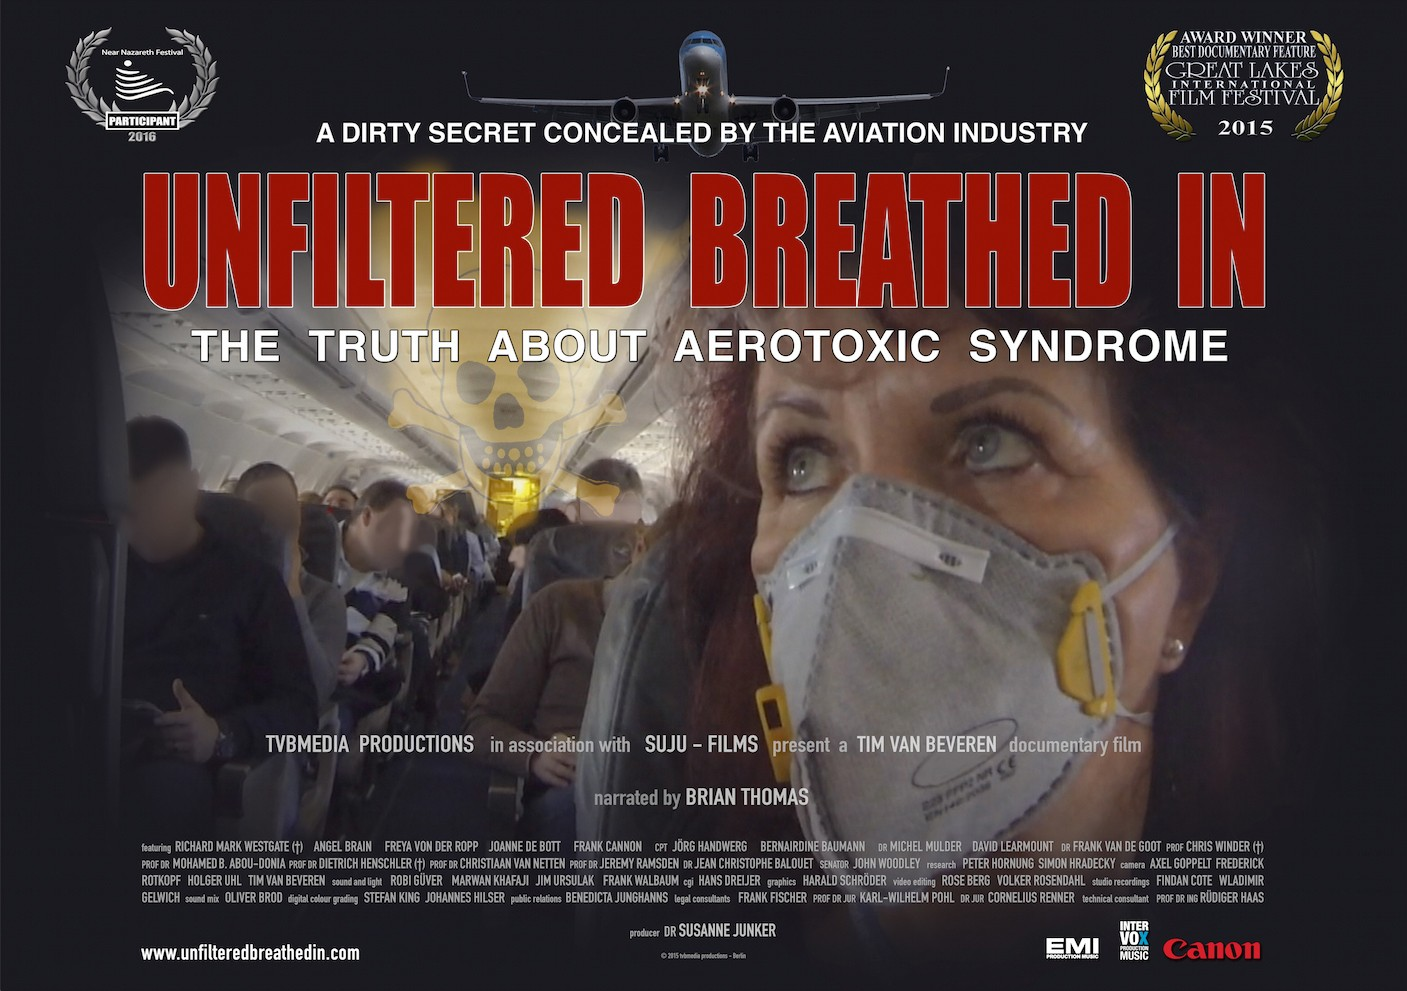 Nepročišćeno disanje - Istina o aerotoksičnom sindromu